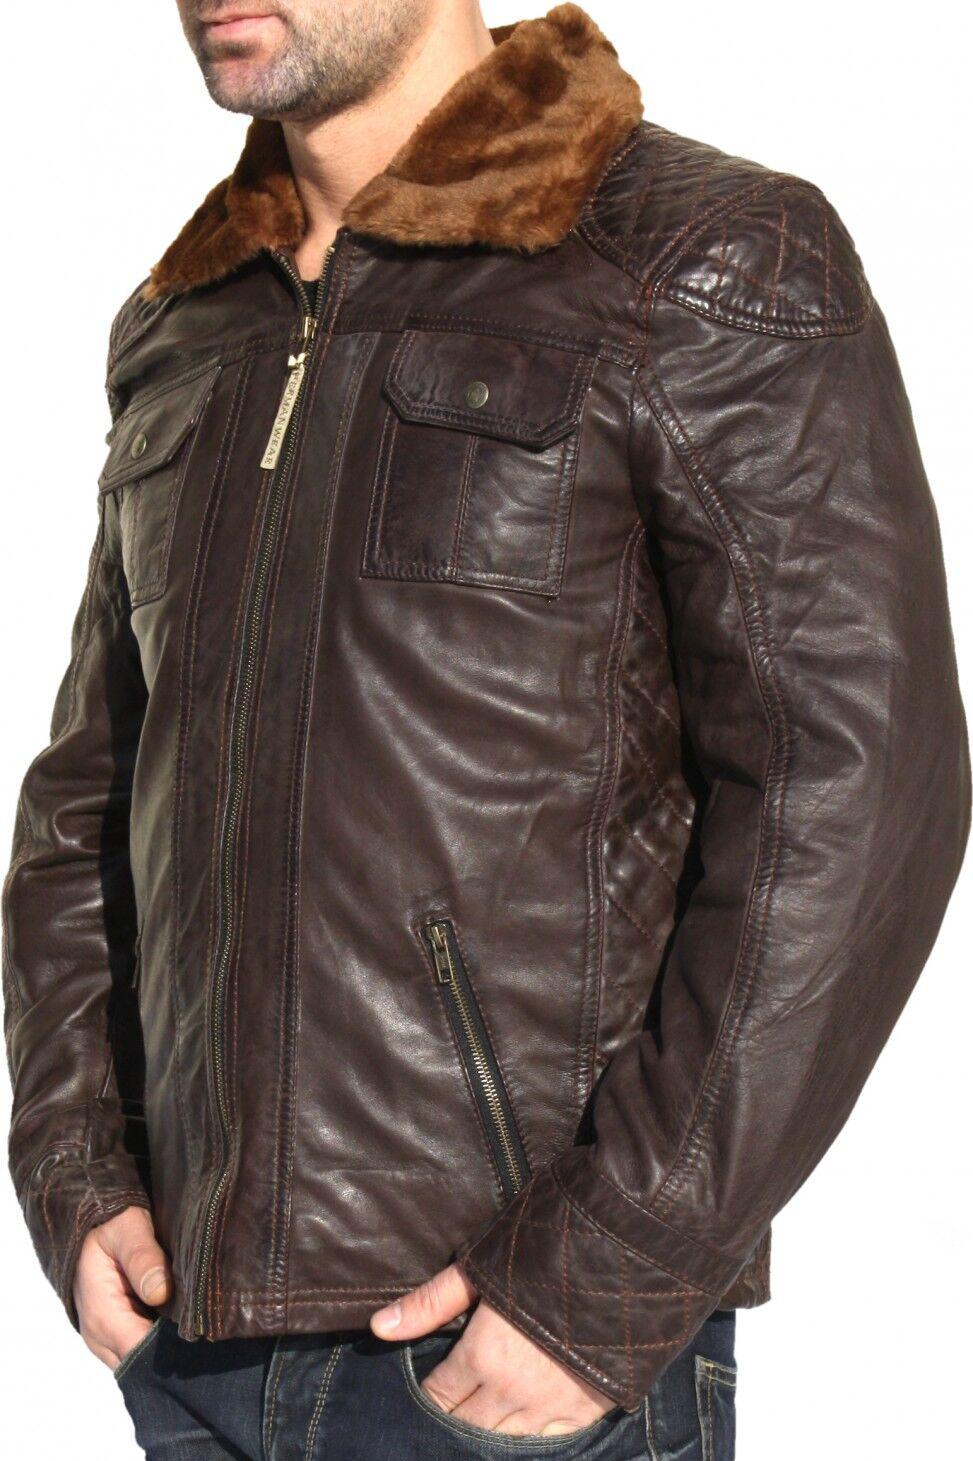 Lederjacke Jacke aus Lamm Nappa Leder Braun mit Pelzkragen 48 - 60 / M - 5 XL